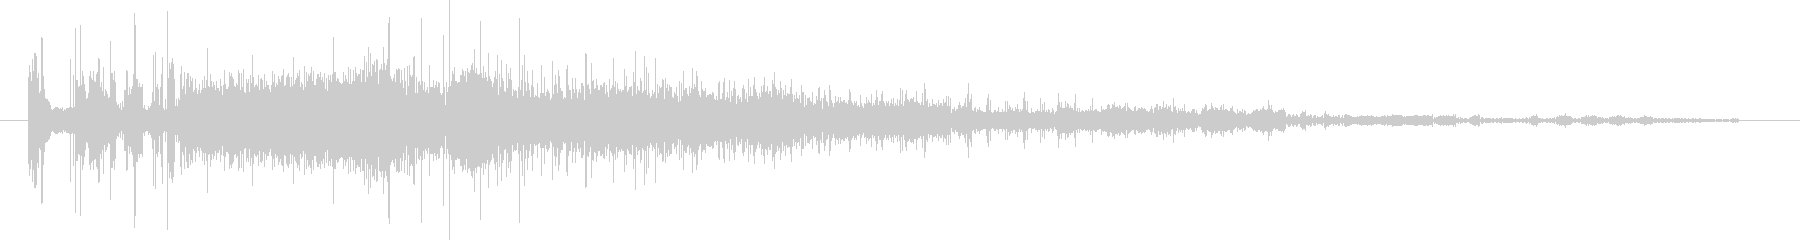 CINEMATIC BEEP 08の未再生の波形